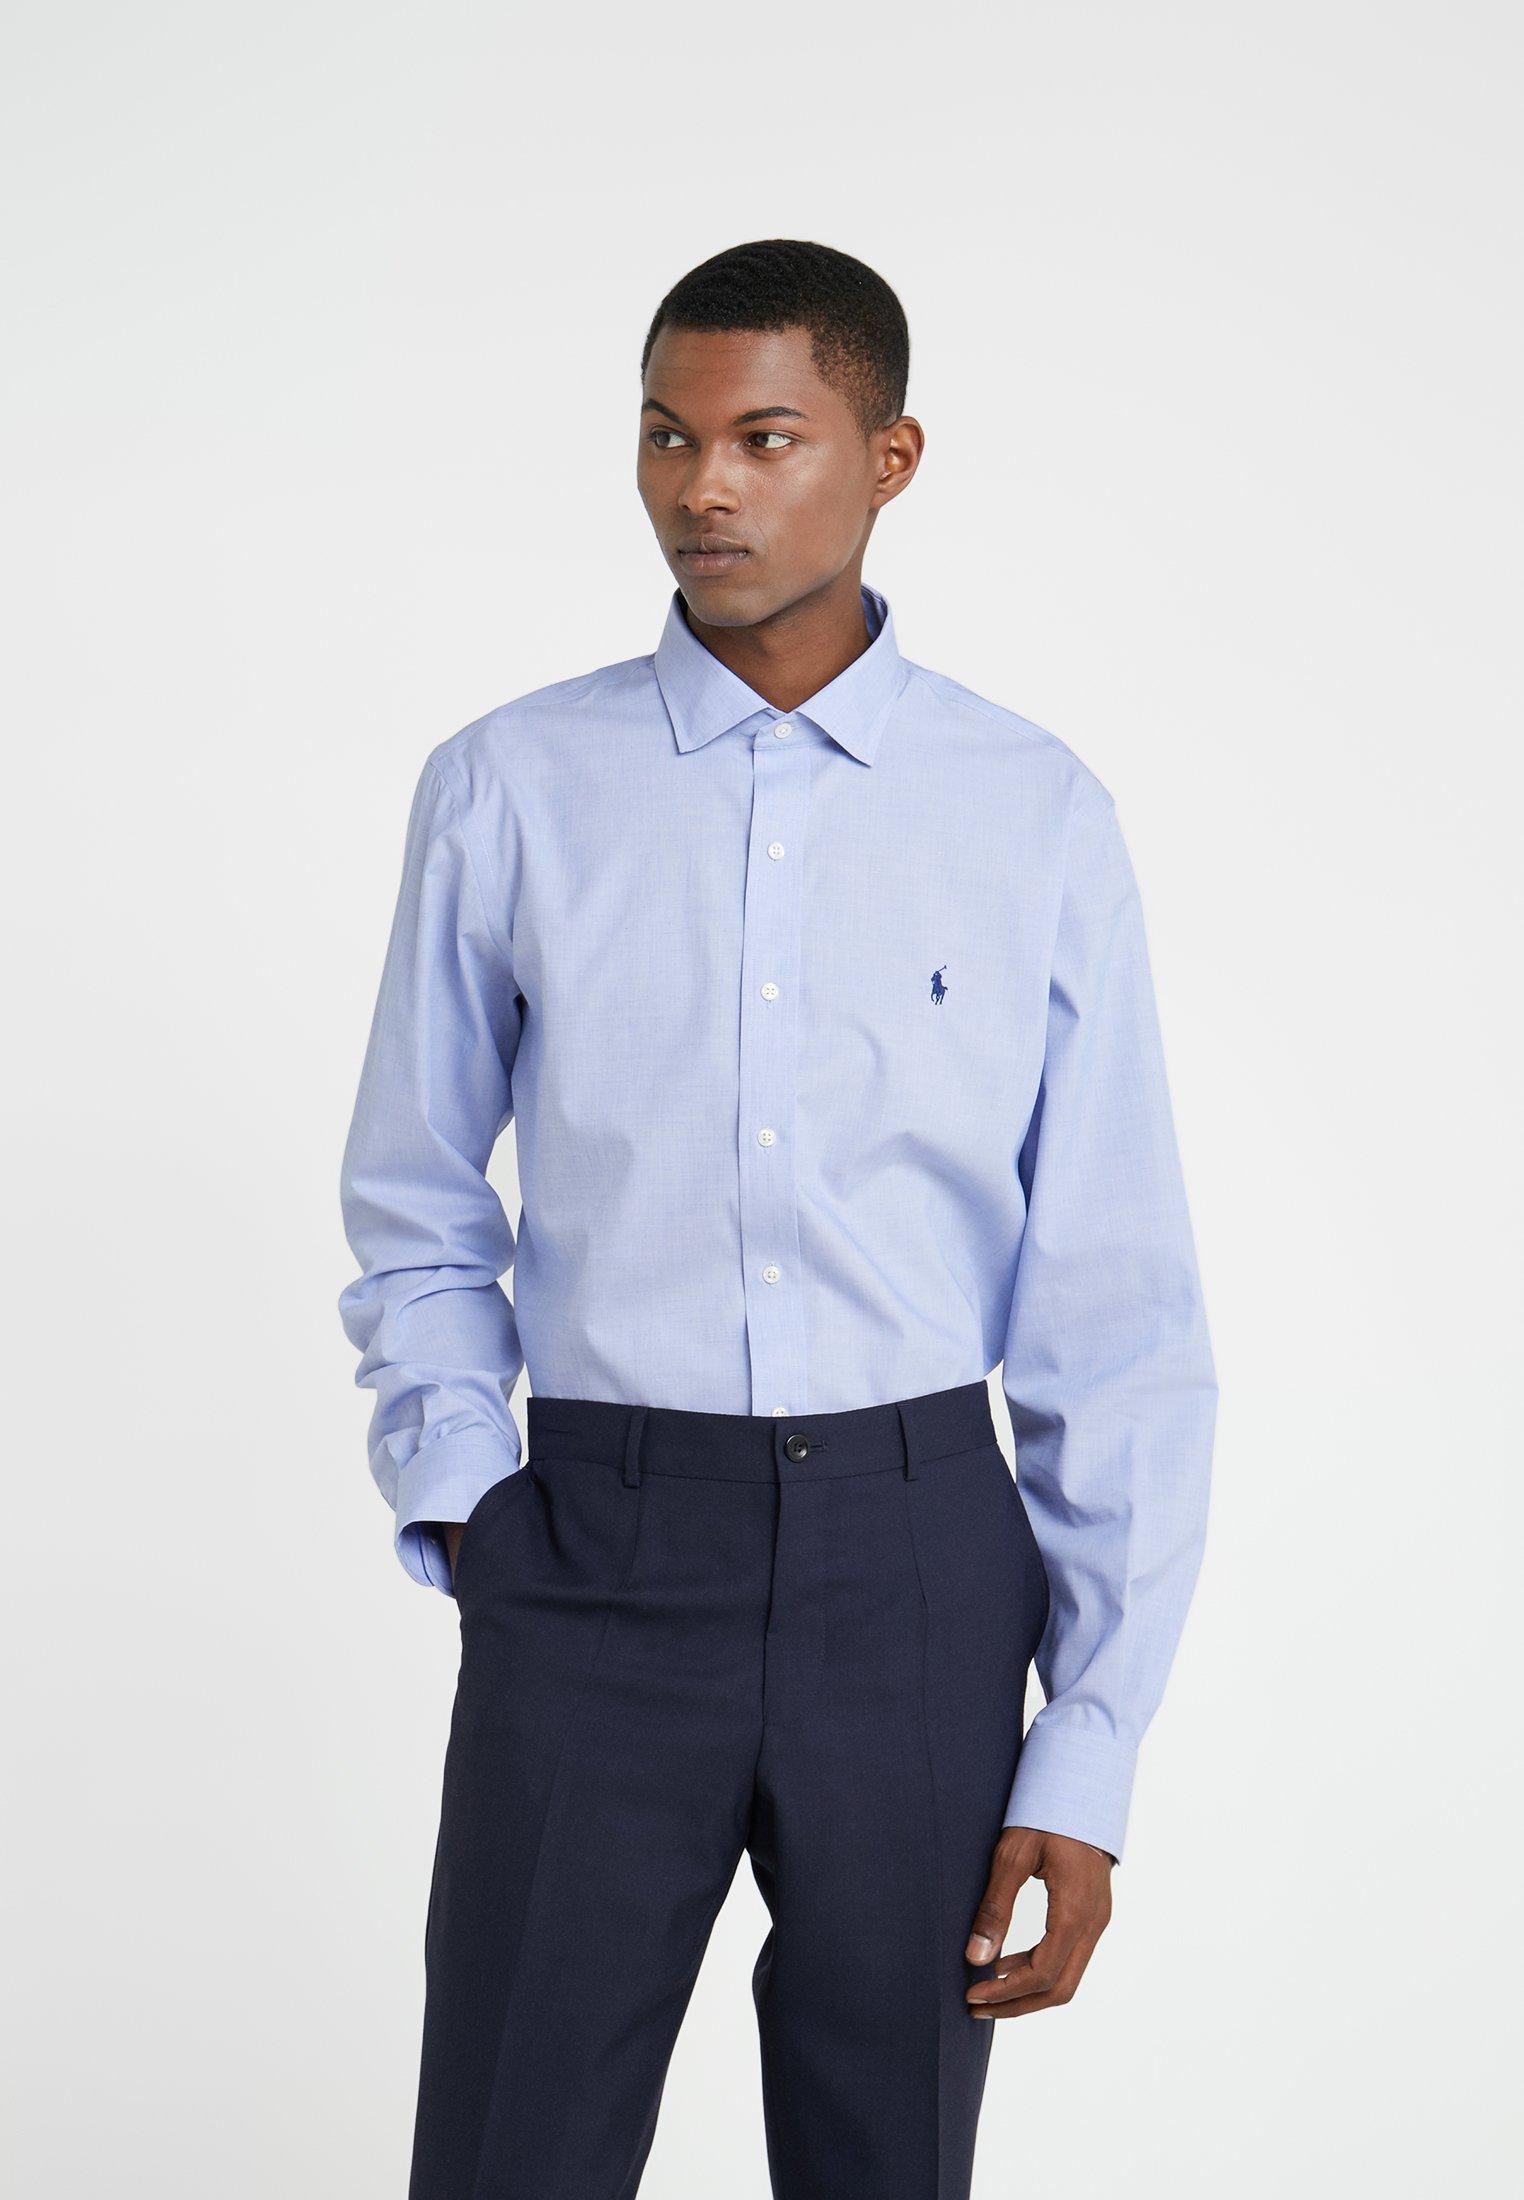 Polo Light Stretch Ralph Lauren IconsChemise Classique BlueWhite Easycare IeWD2YbHE9